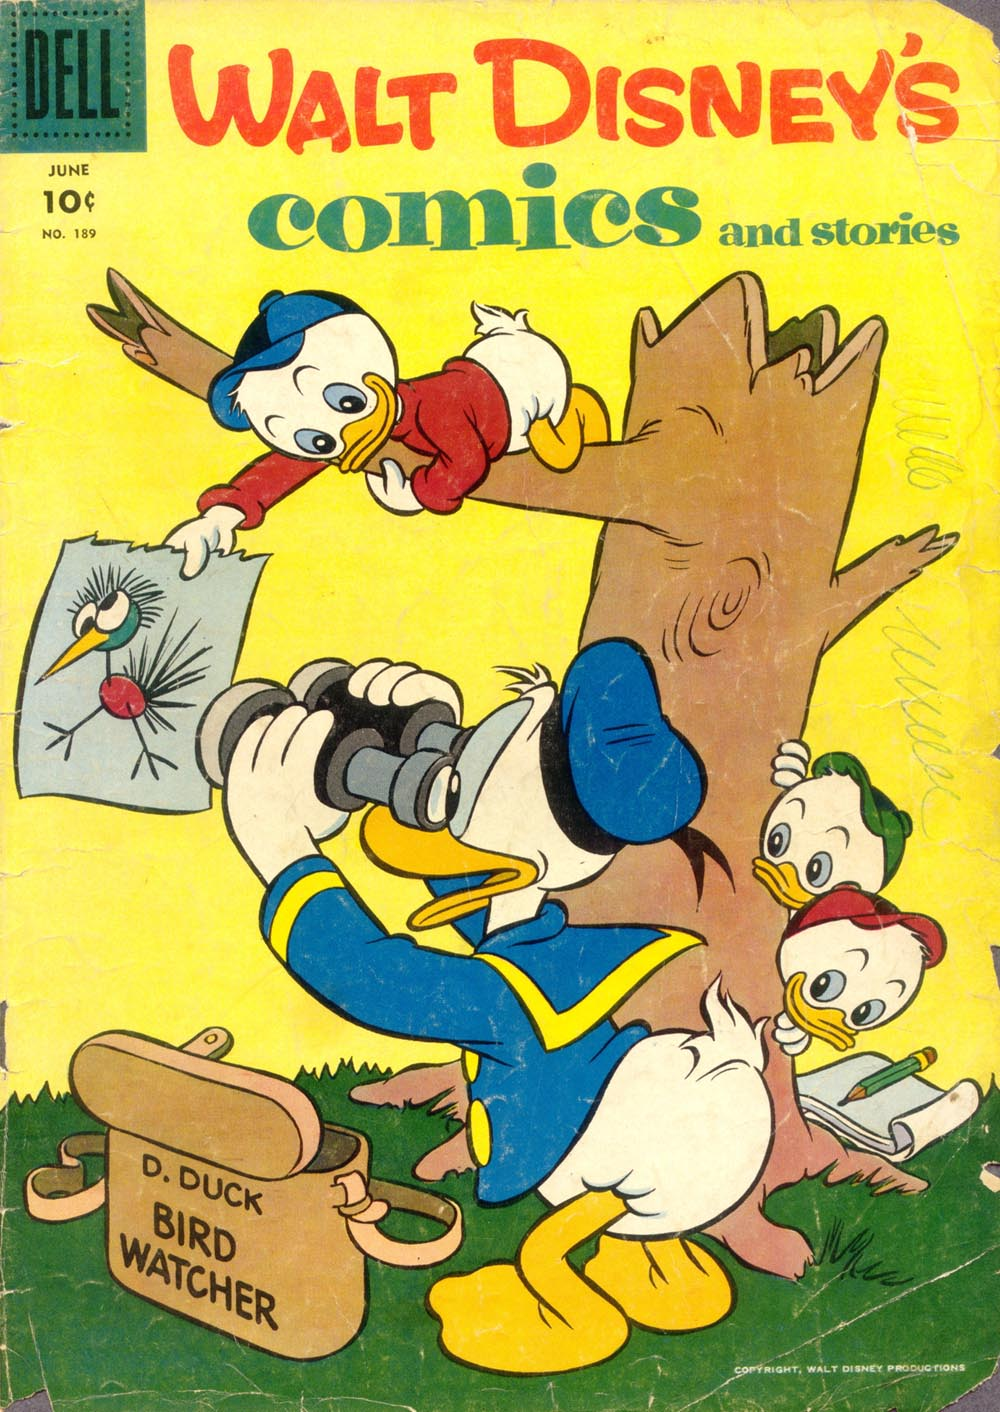 Walt Disneys Comics and Stories 189 Page 1